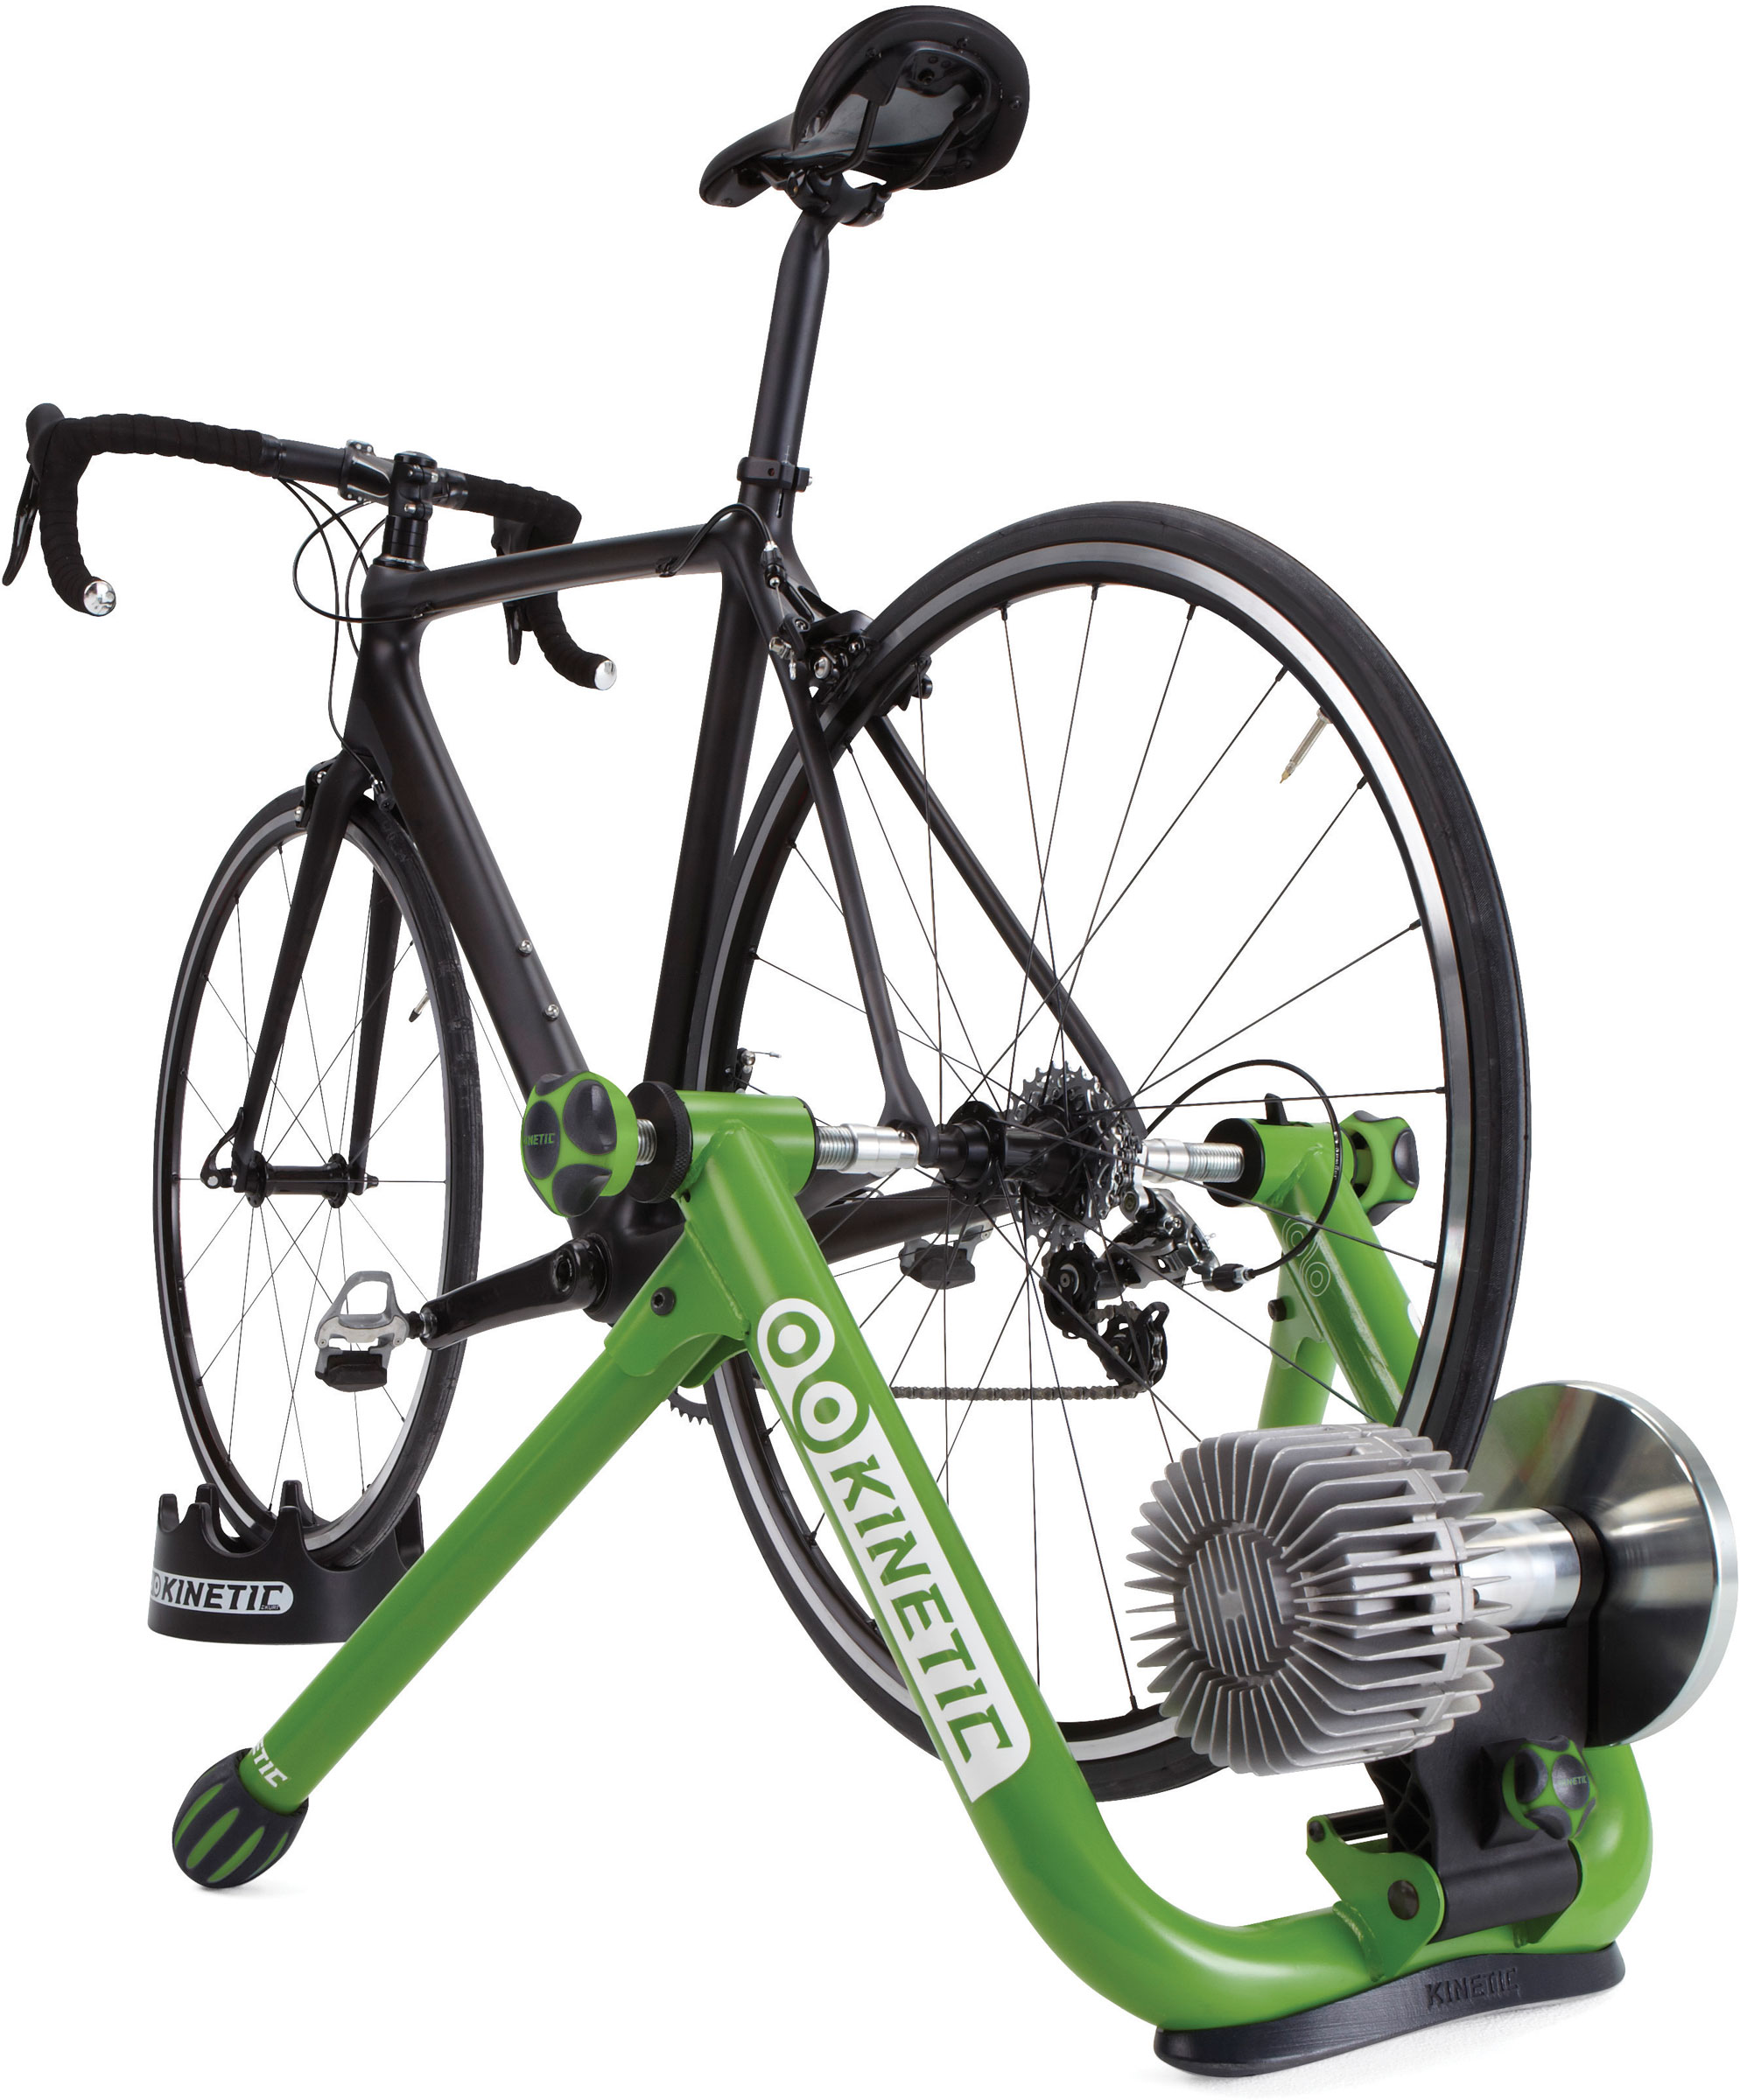 cc5152450ff Kinetic Road Machine 2.0 Fluid Trainer -